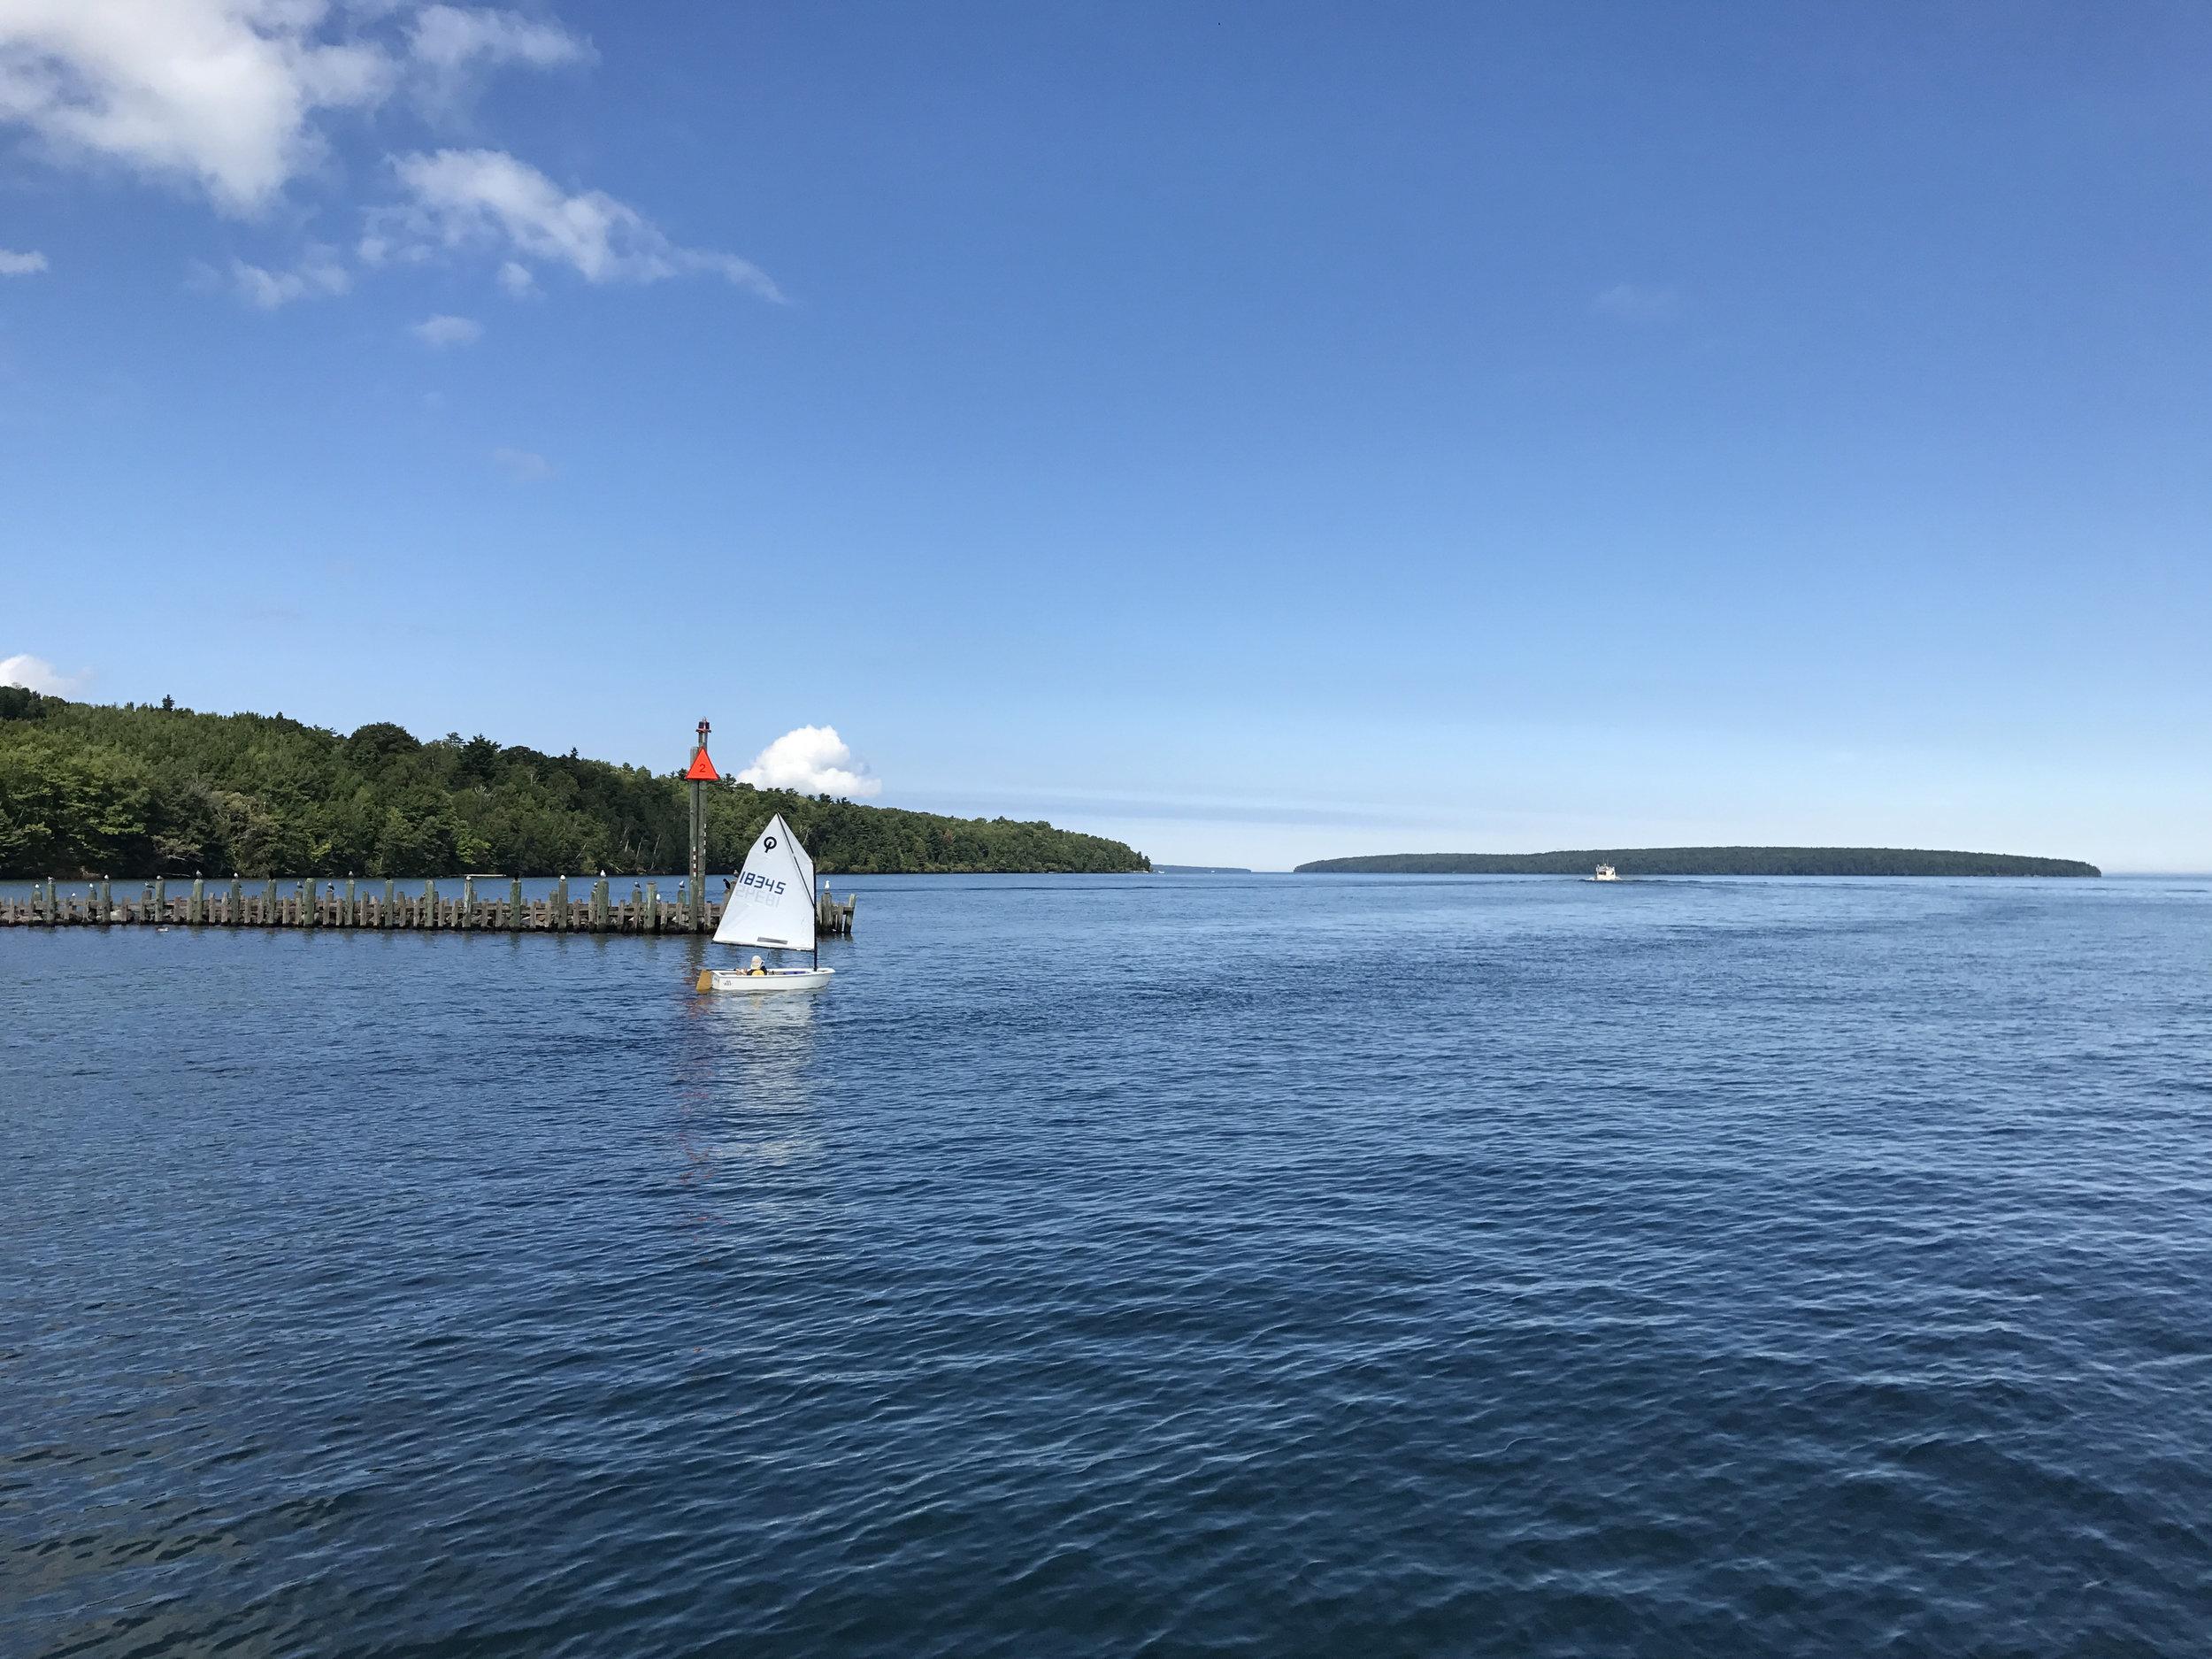 Leaving Bayfield for Madeline Island